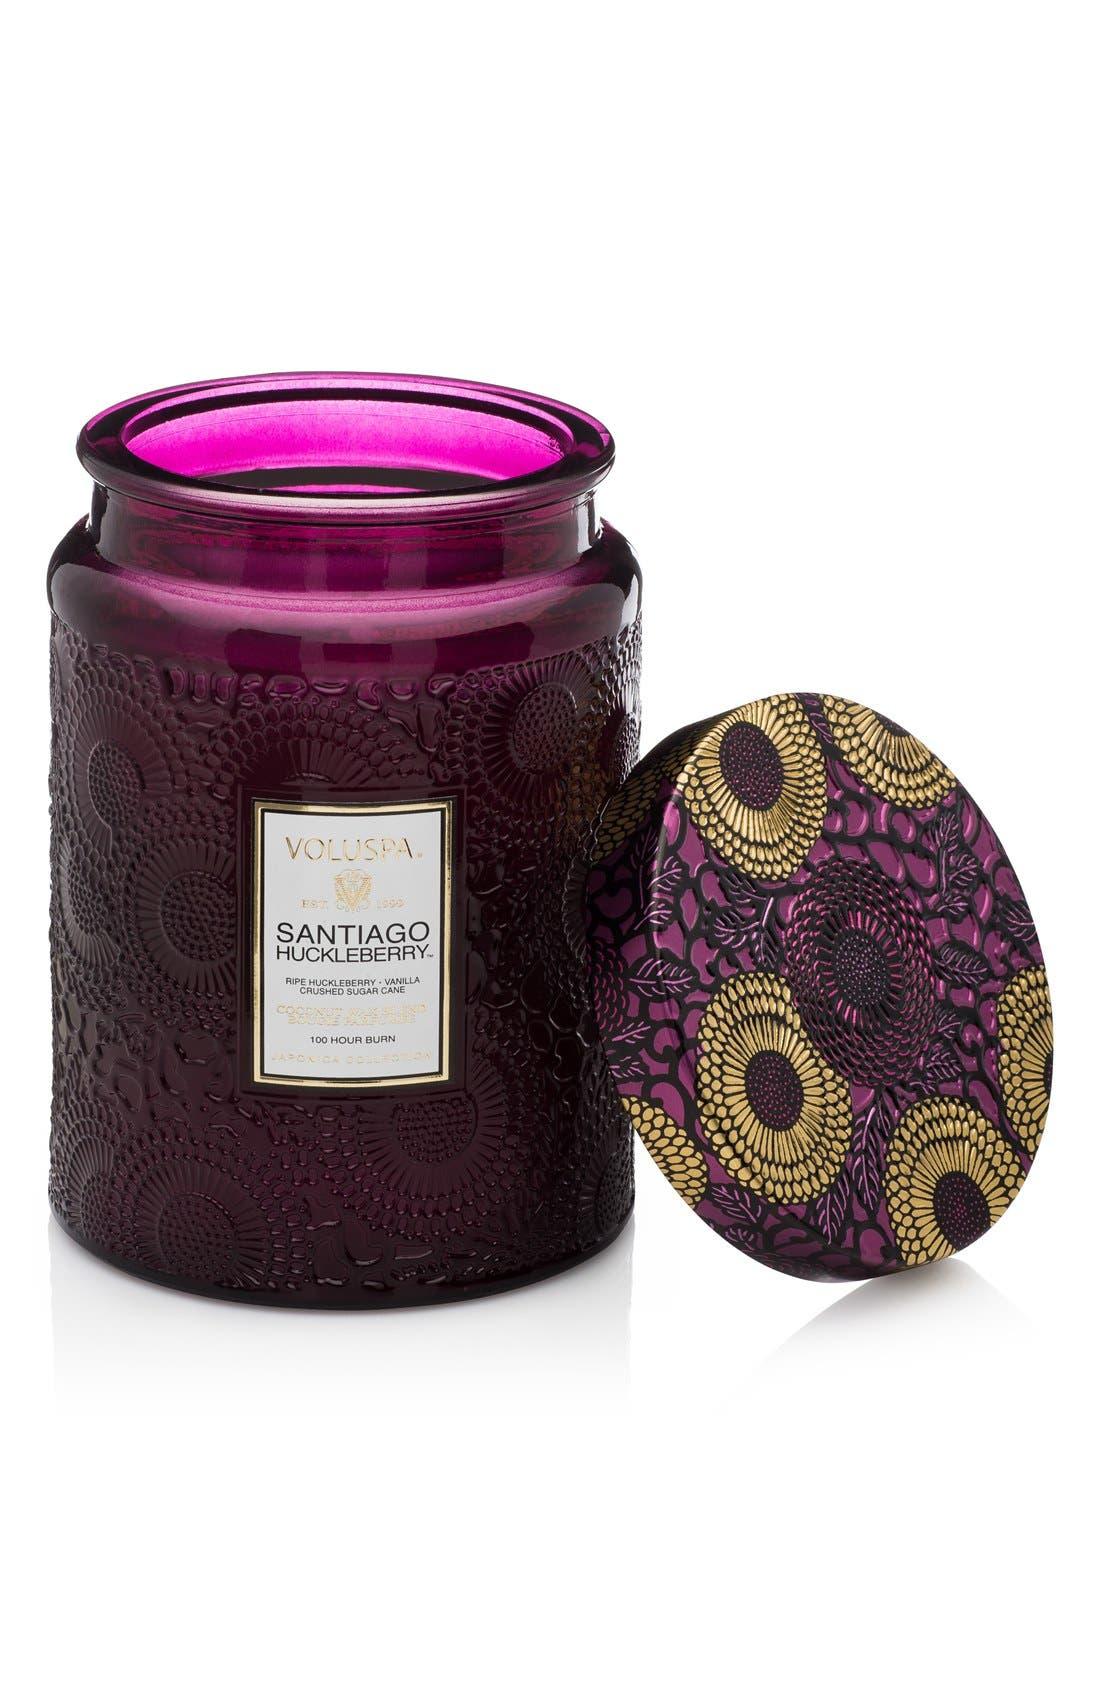 Alternate Image 1 Selected - Voluspa Japonica Santiago Huckleberry Large Jar Candle